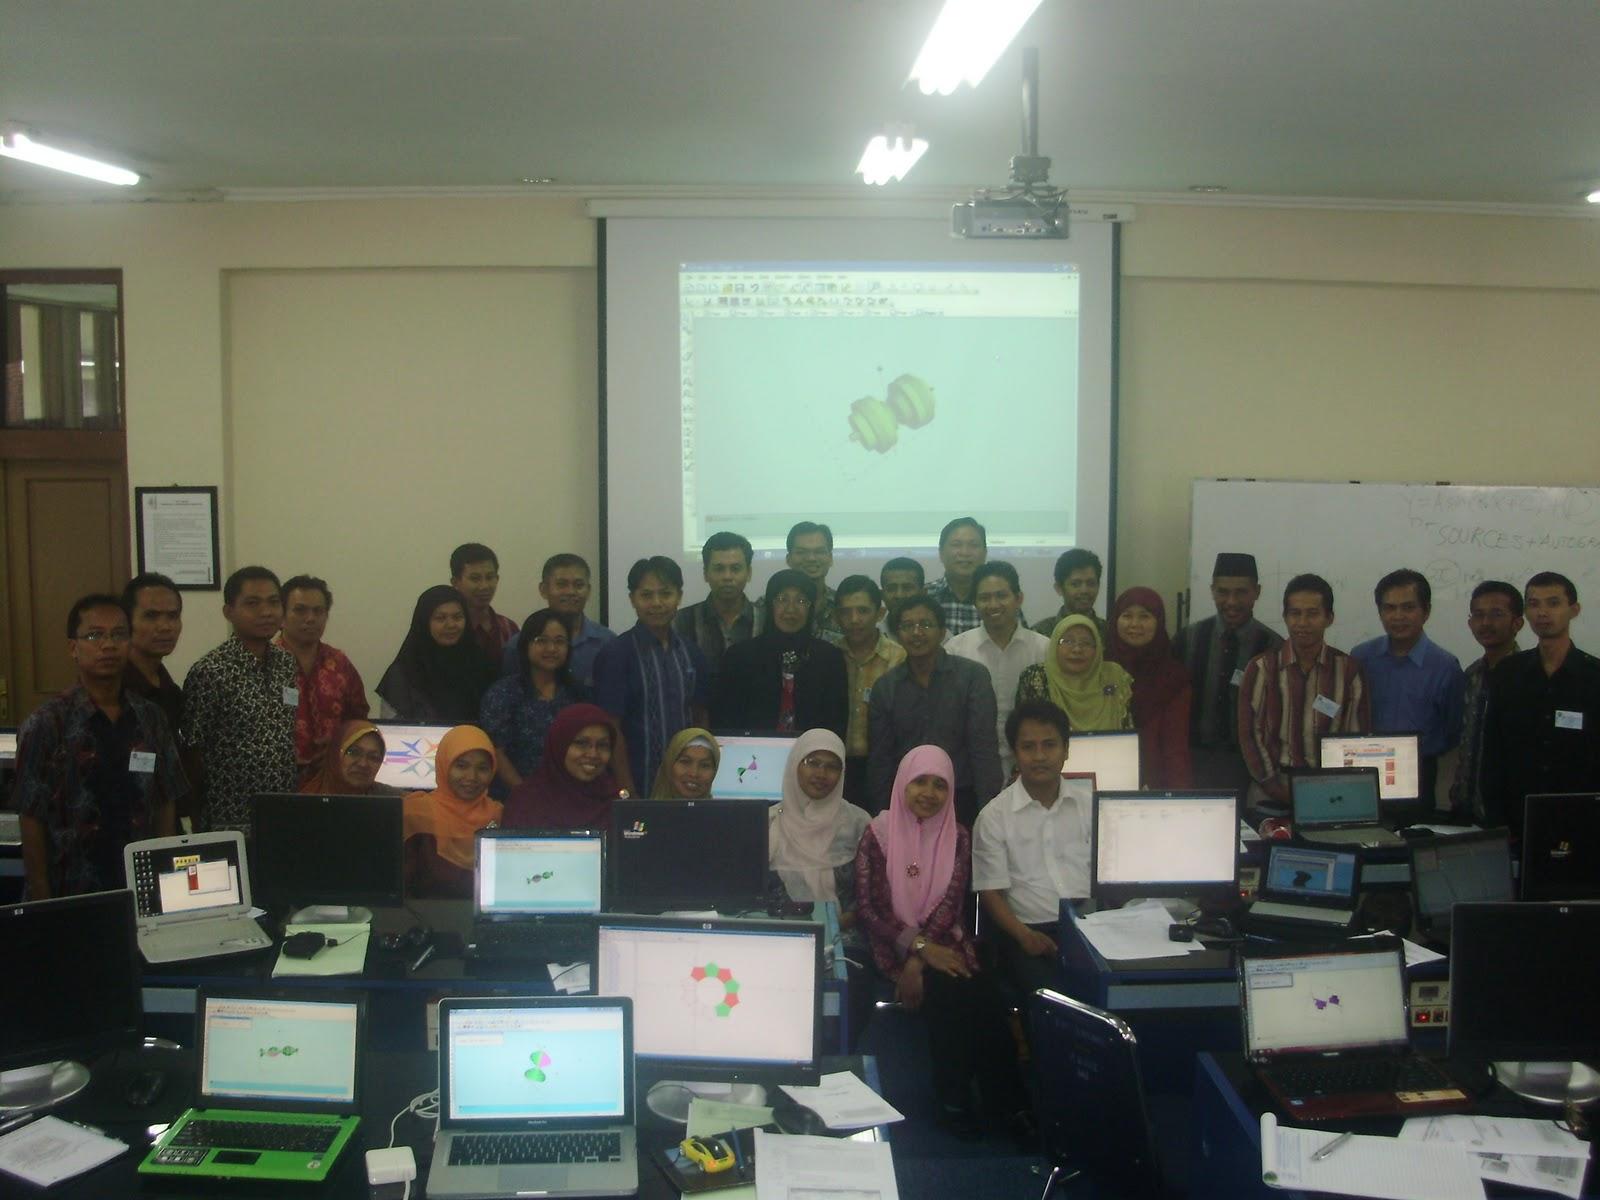 Kumpulan Blog Peserta Mml 2011 Pbm Matematika Iwan Sumantri